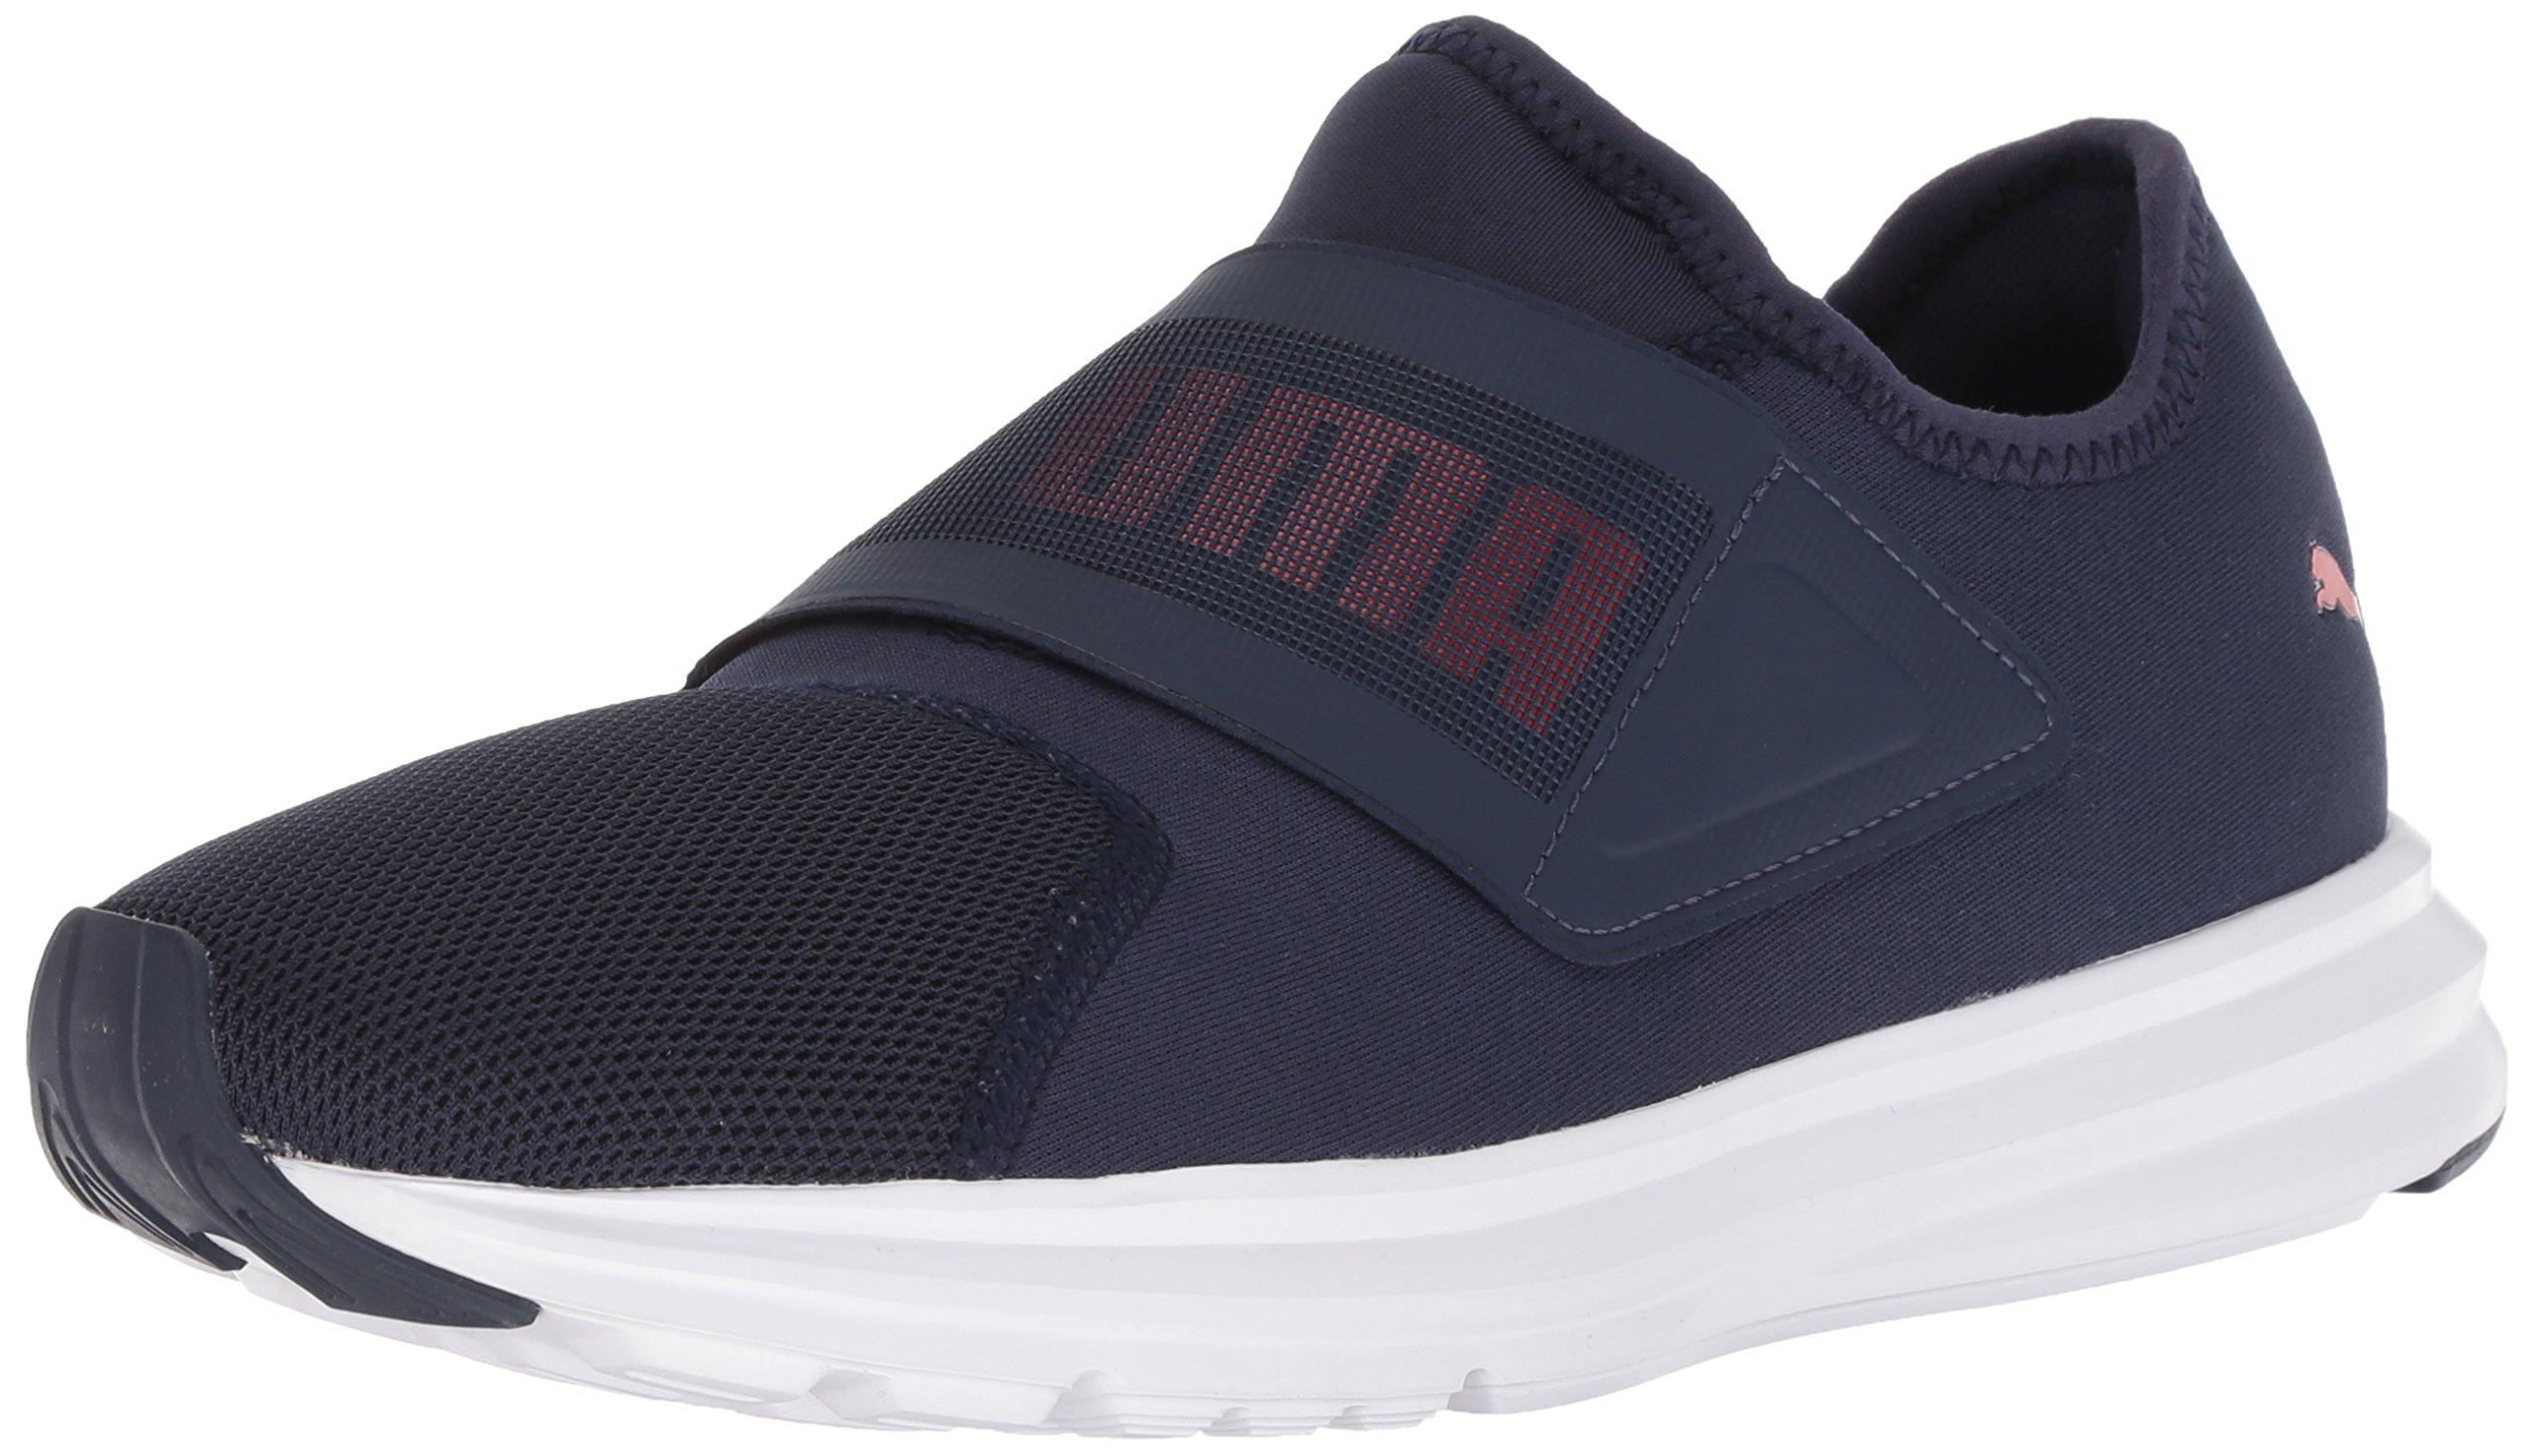 PUMA Men's Enzo Strap Sneaker, Peacoat White-Ribbon Red, 10.5 M US